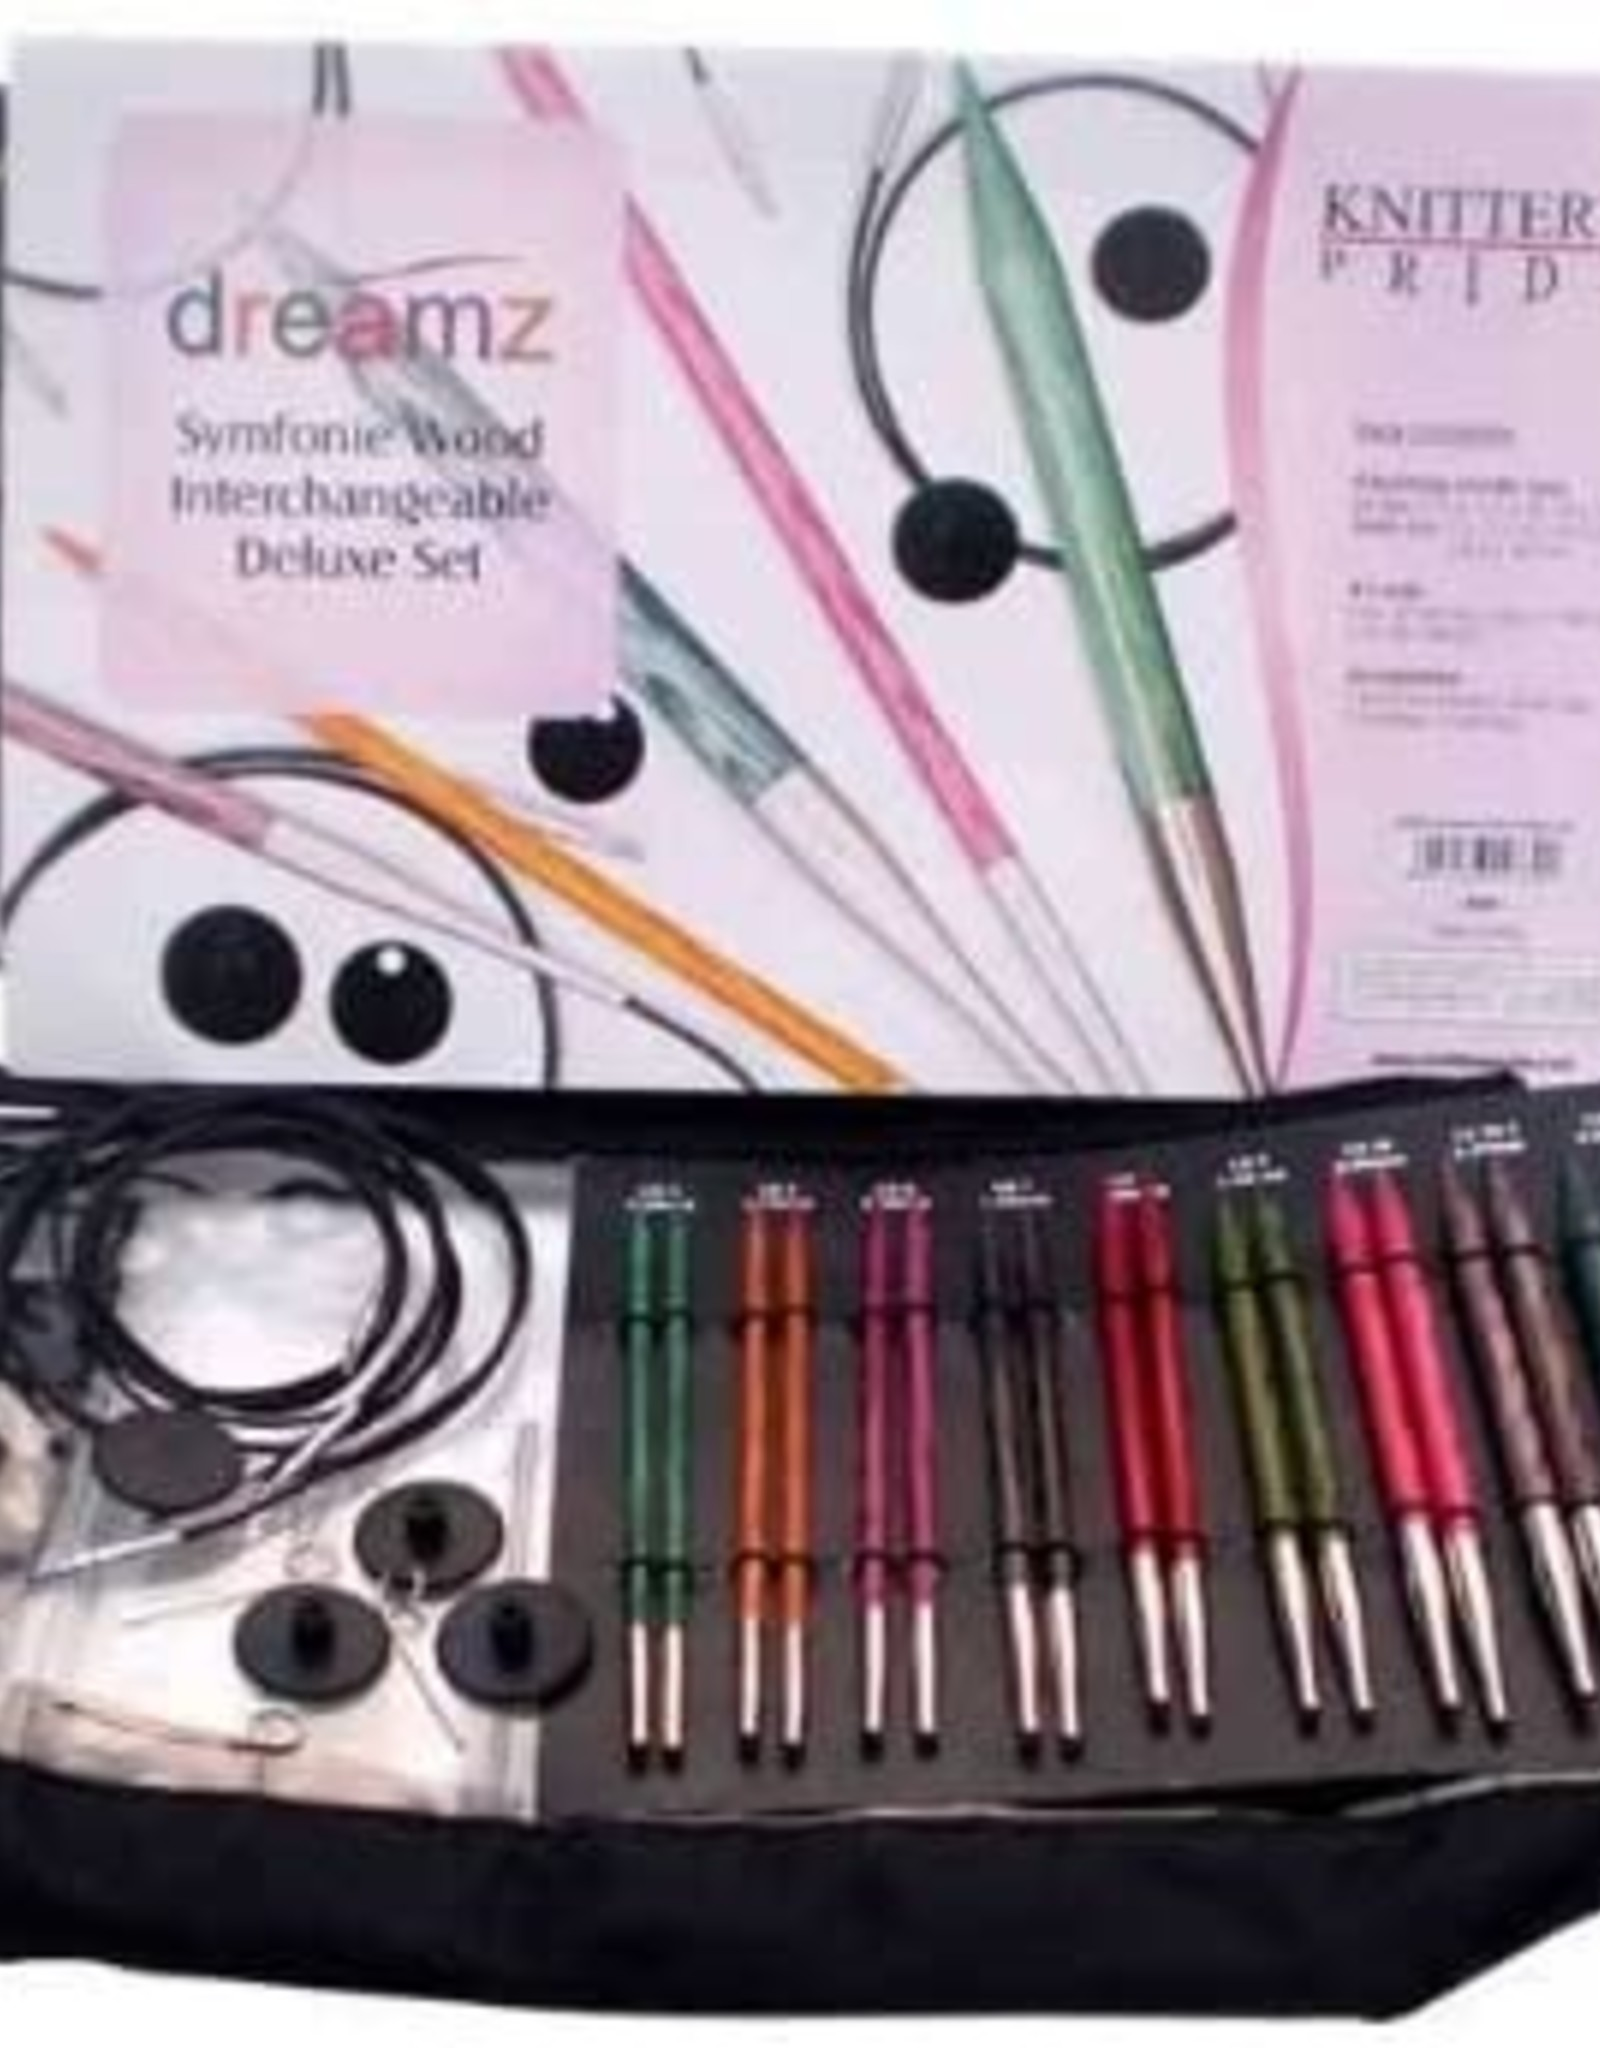 Knitter's Pride Dreamz Symfonie Circular Deluxe Set